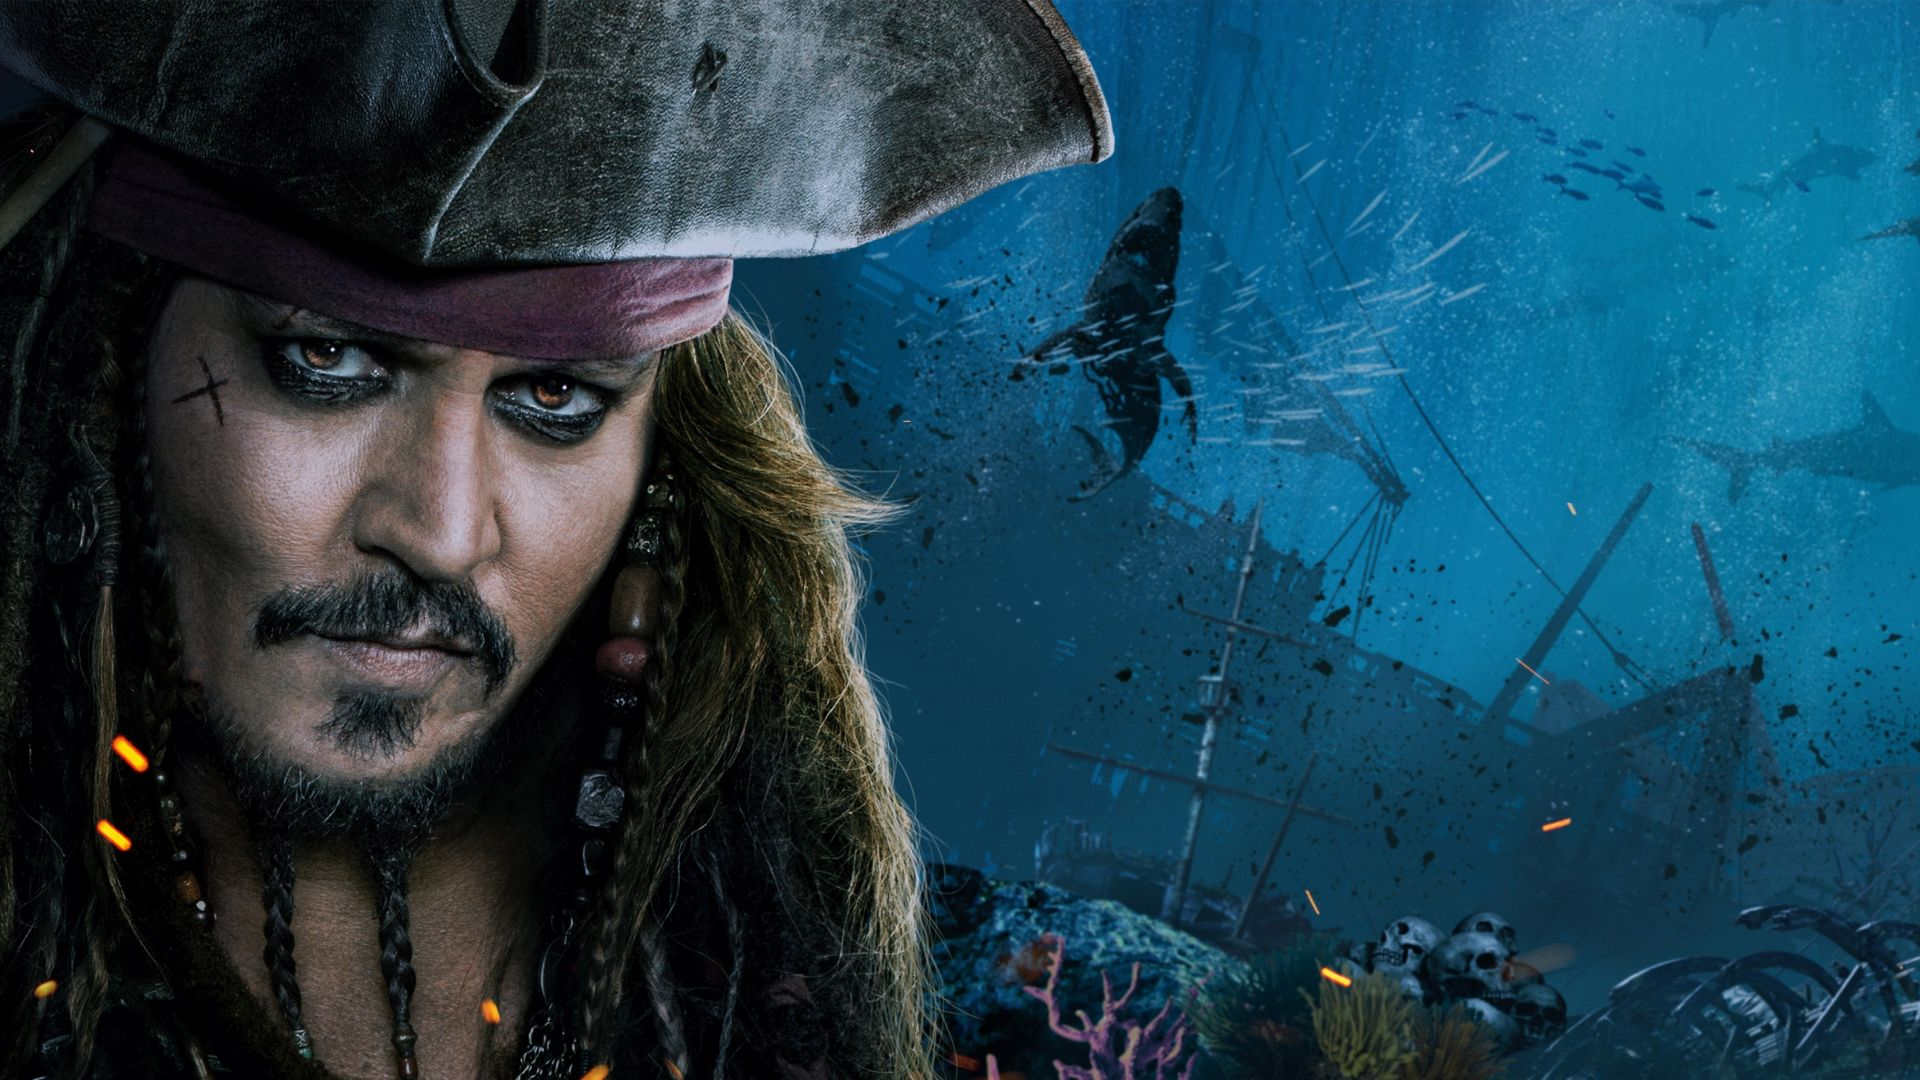 Dead Men Tell No Tales Wallpaper: Desktop Wallpaper Johnny Depp, Pirates Of The Caribbean